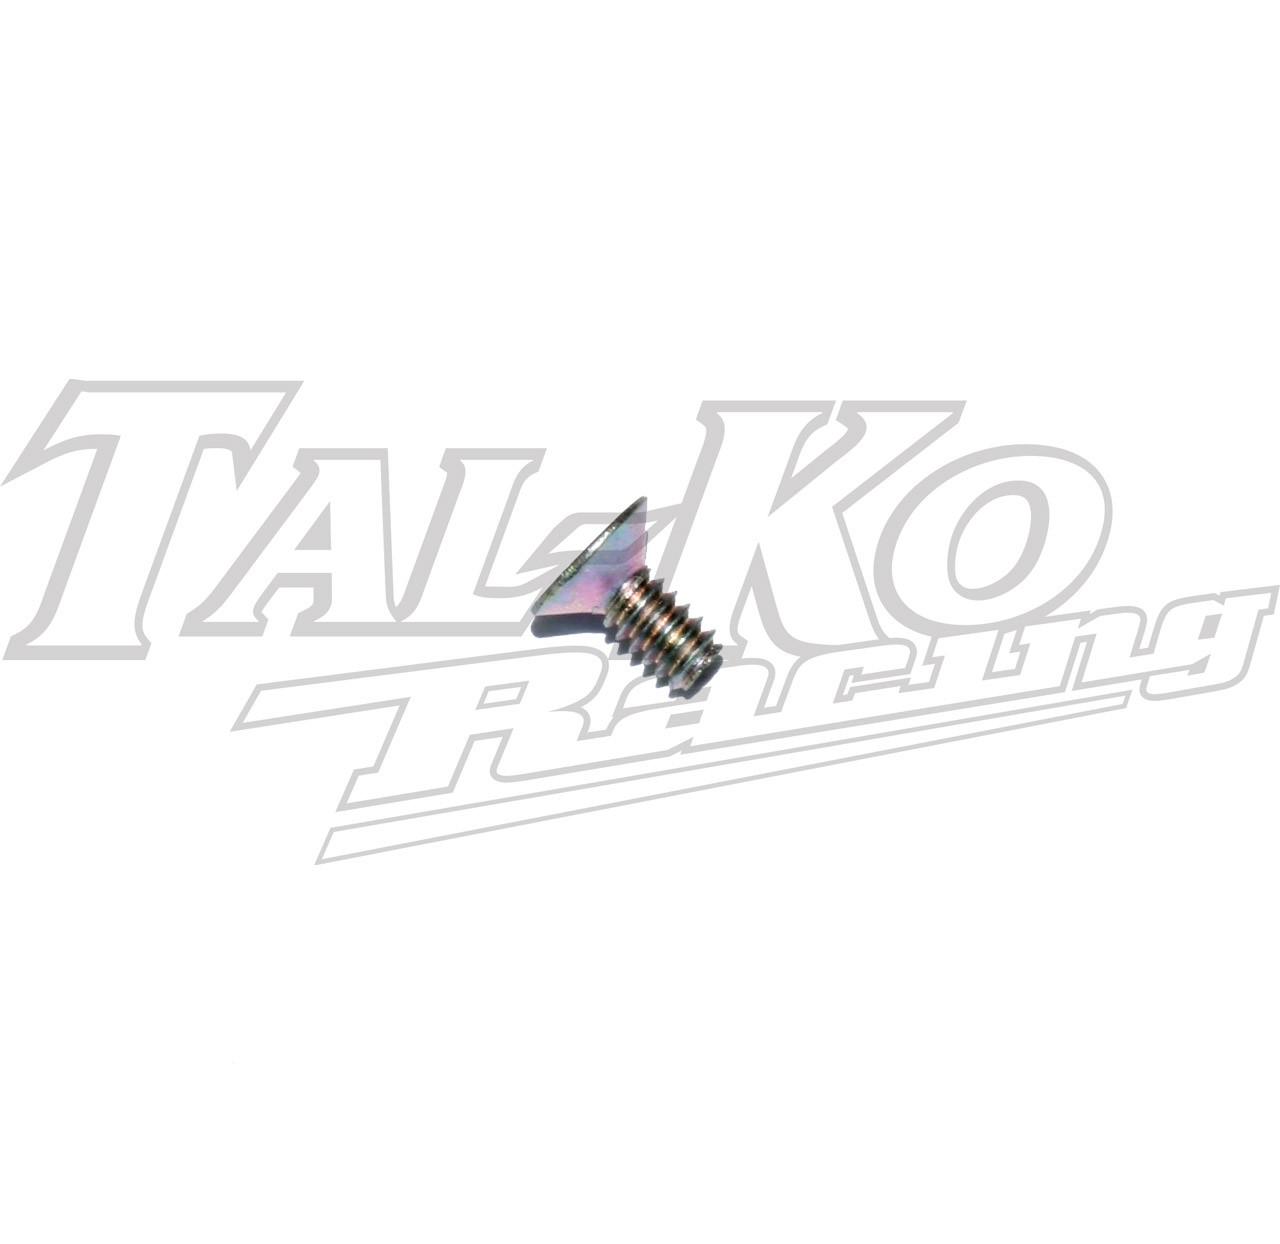 TKM BT82 WALBRO CIRCUIT PLATE SCREW